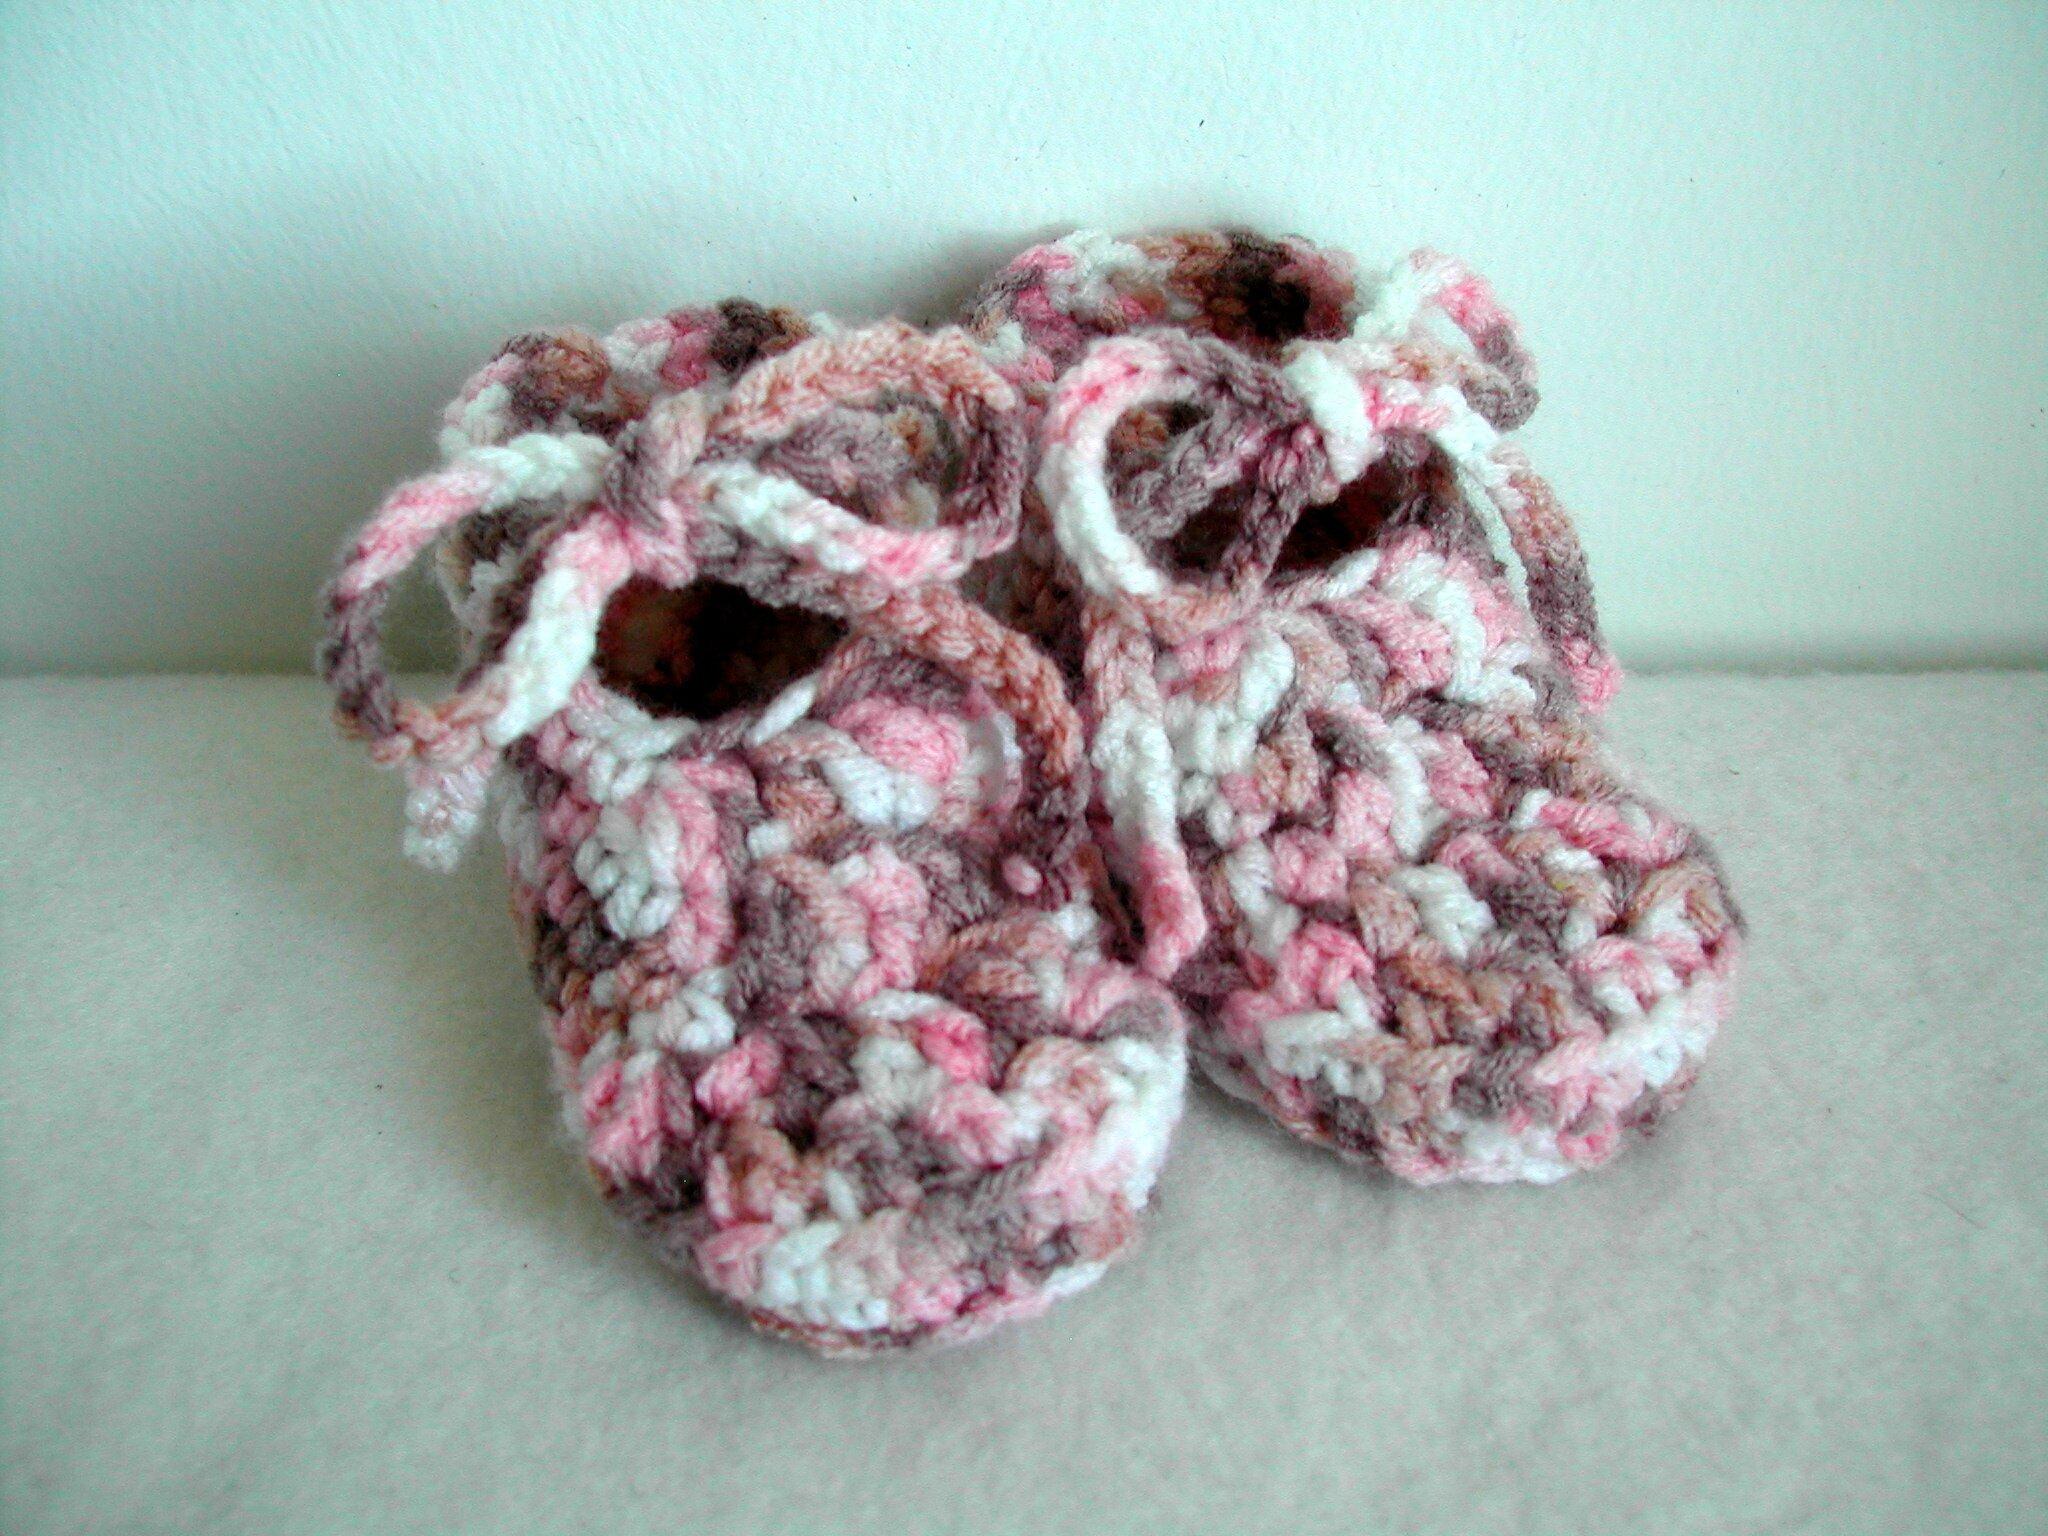 chaussons crochet 0-3 mois